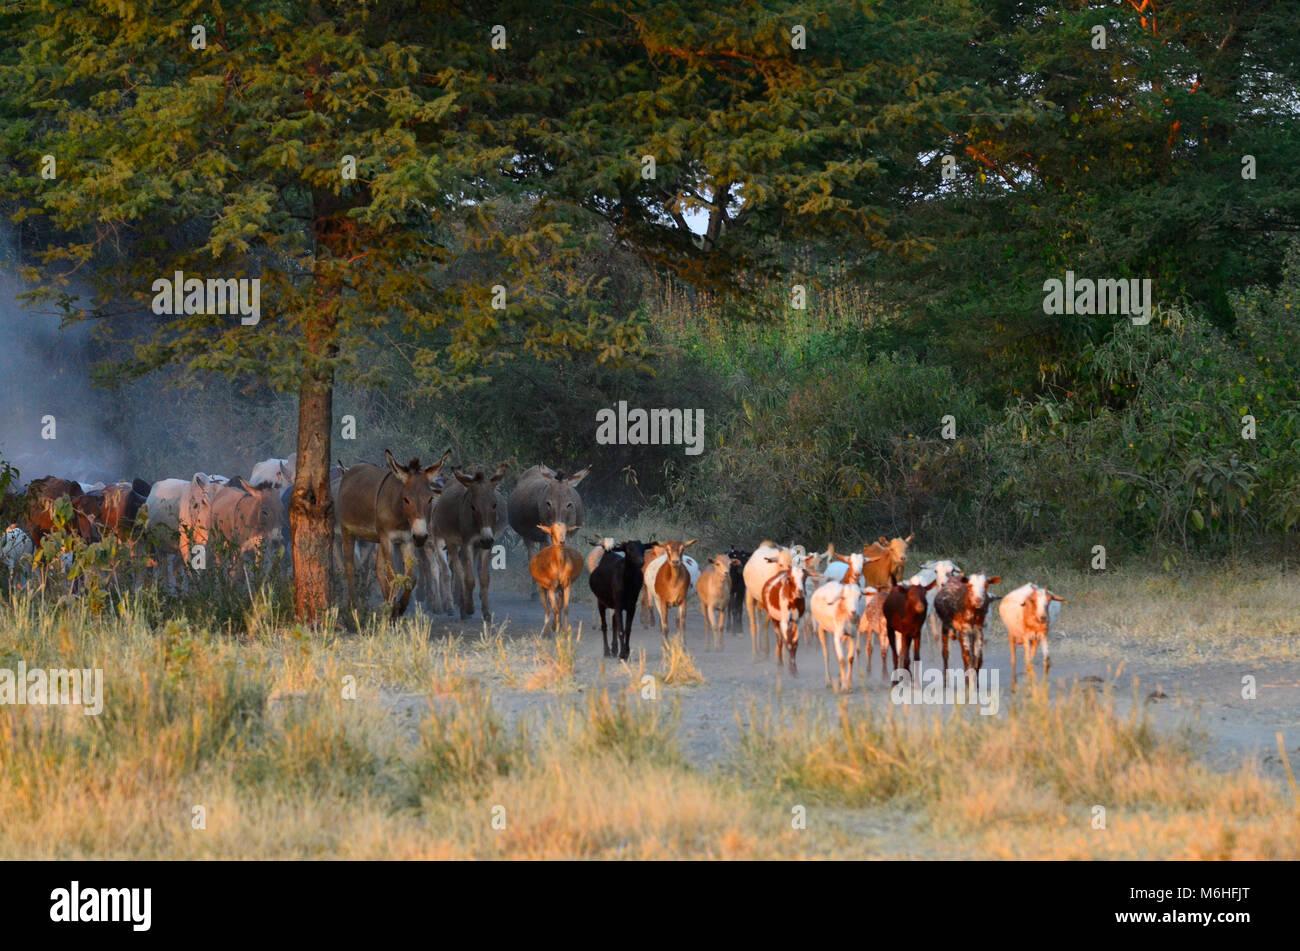 Masaai goaats, donkeys and herders near Tarangire national park, Tanzania. - Stock Image